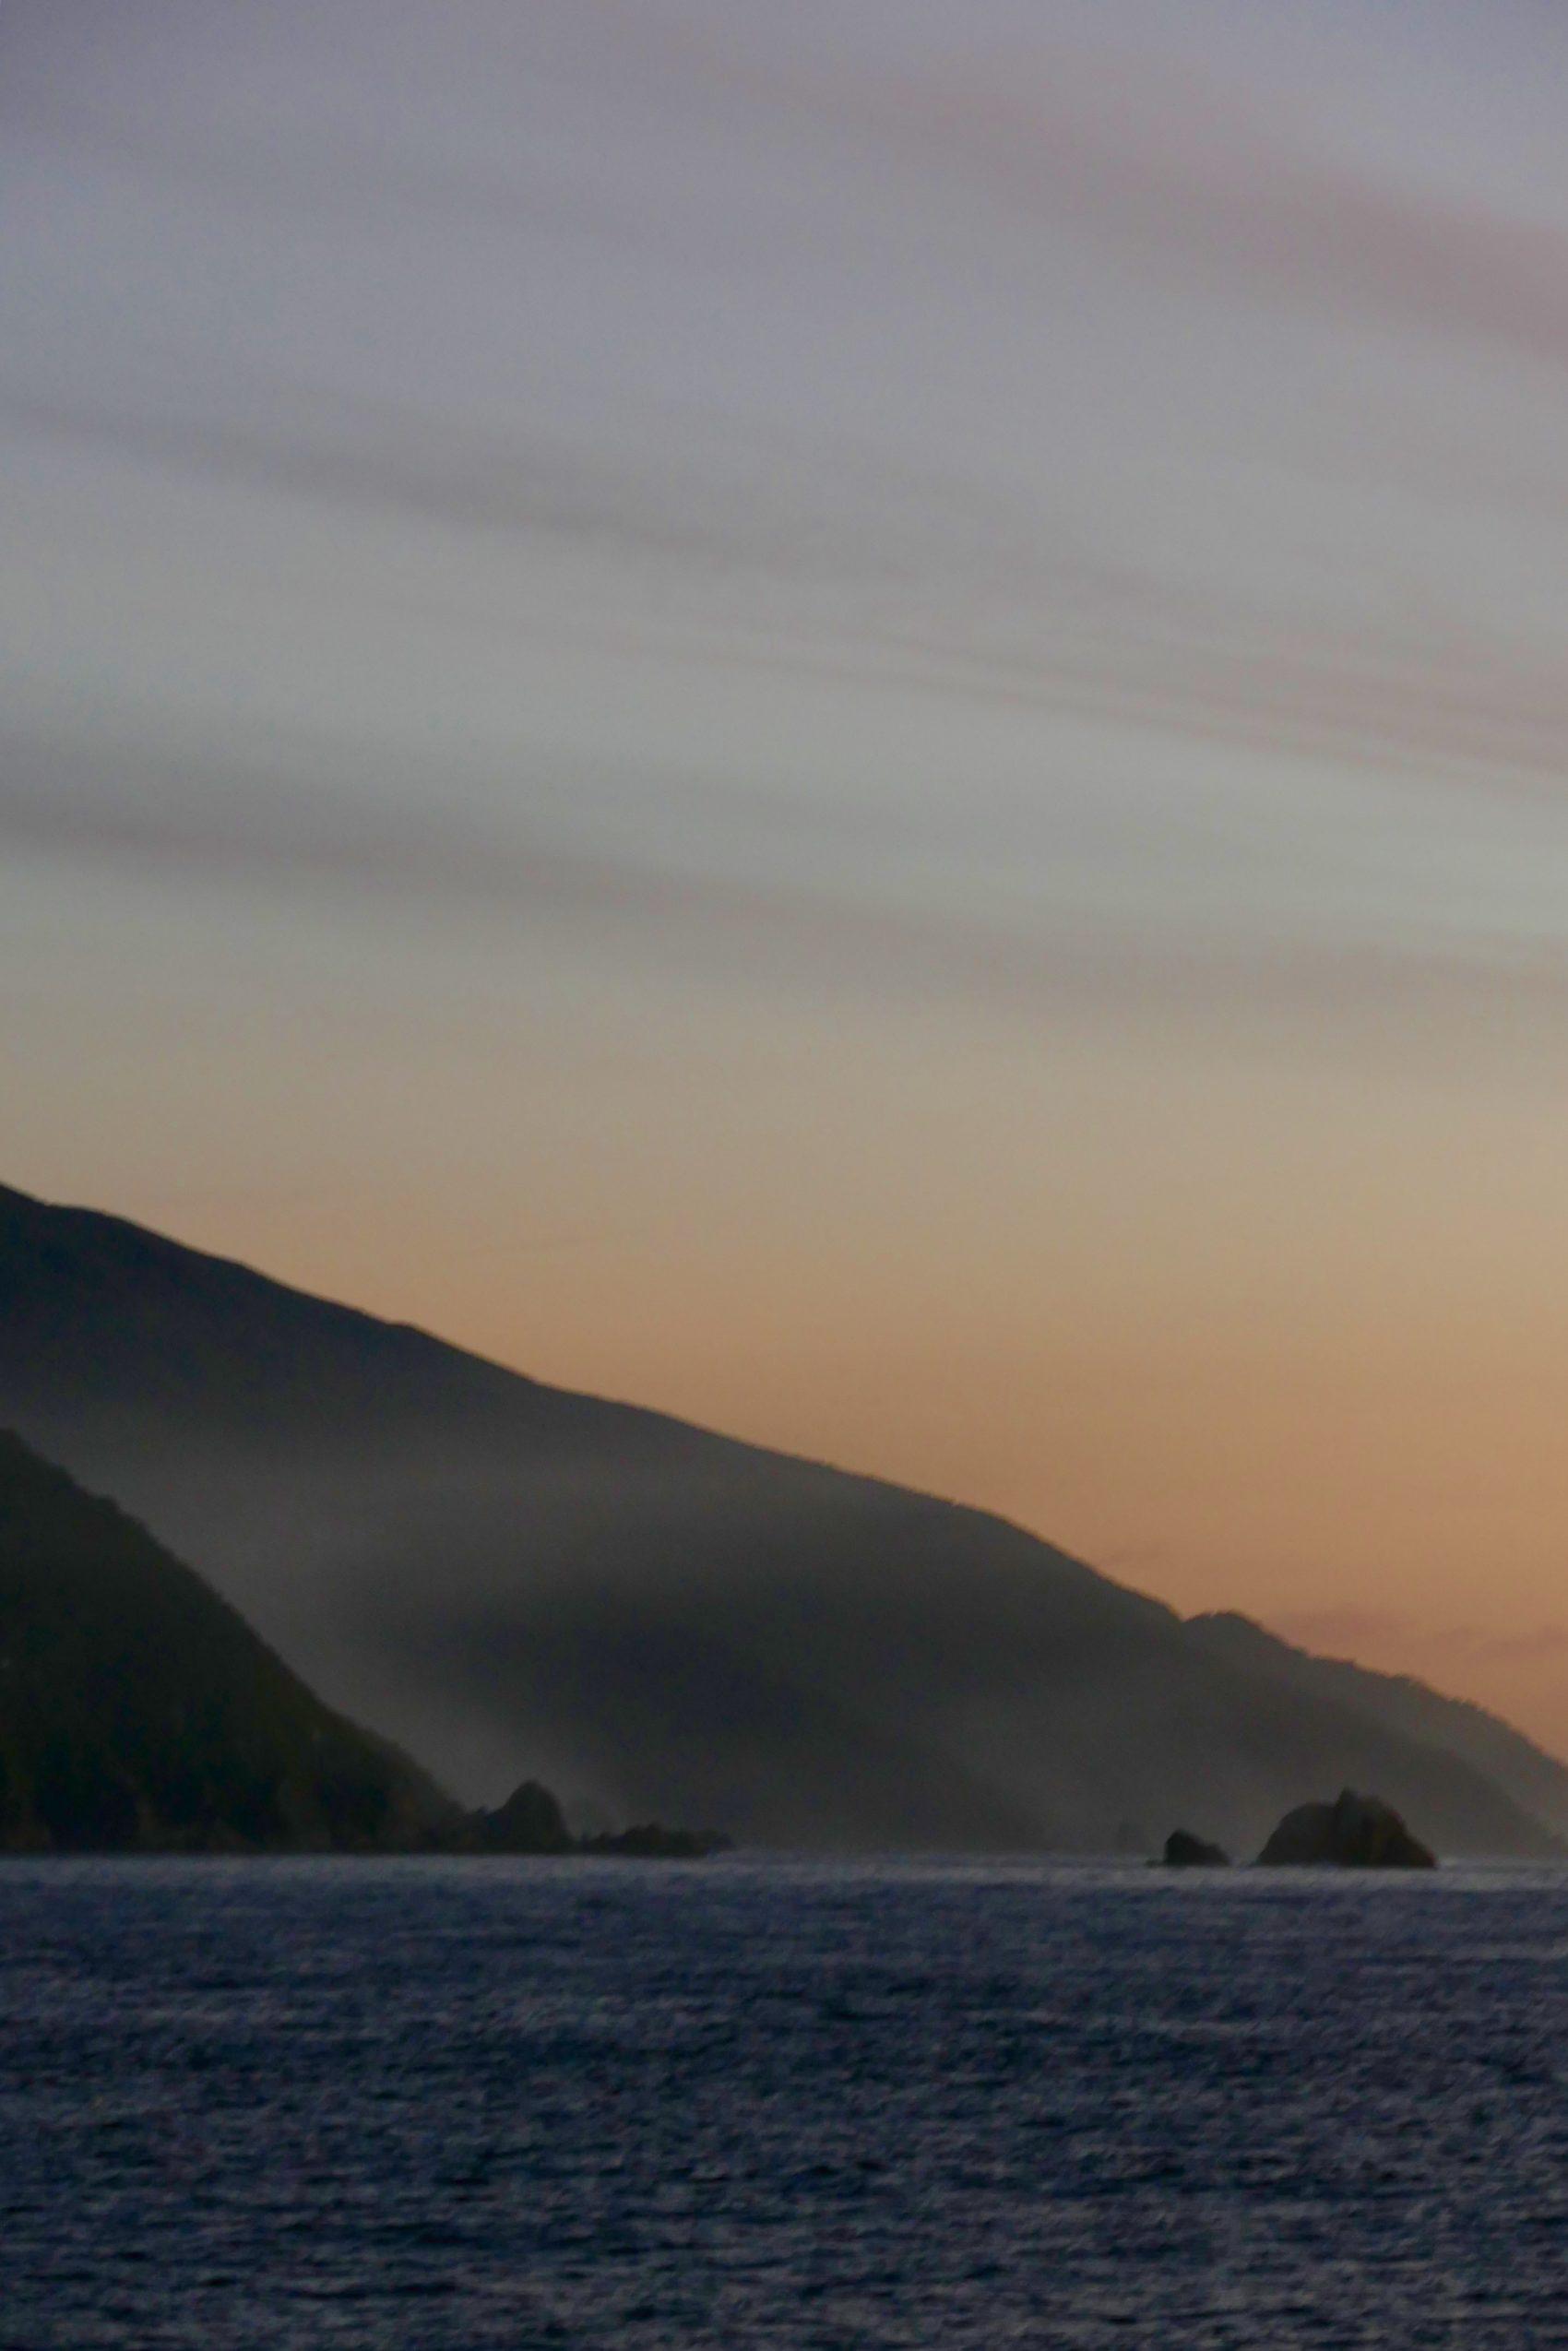 Ocean meets fiord: Doubtful Sound. All photos copyright Doug Spencer.